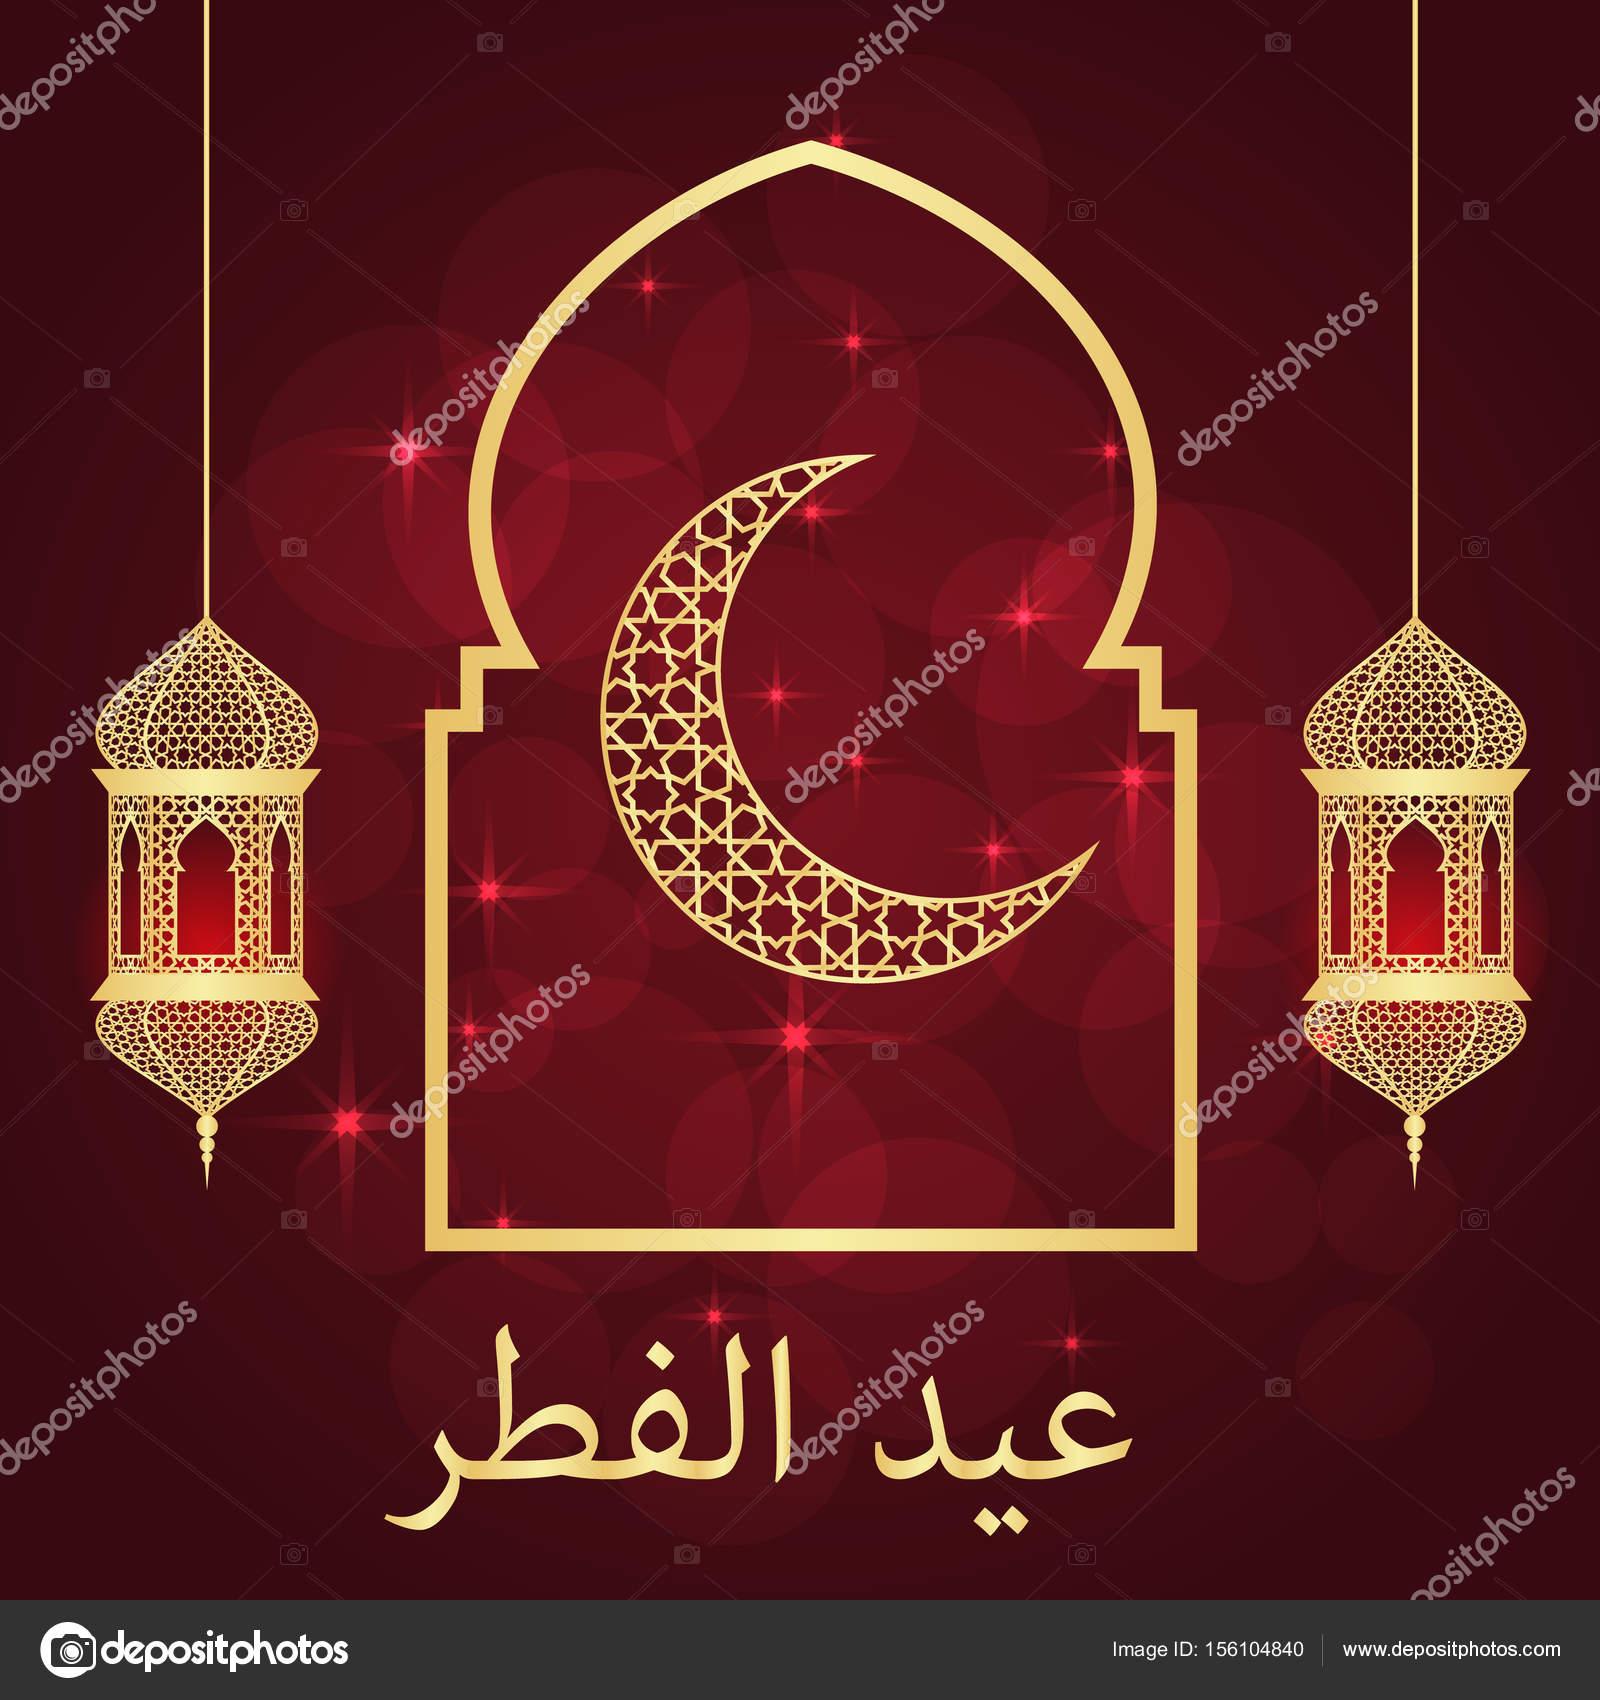 Popular Id Festival Eid Al-Fitr Greeting - depositphotos_156104840-stock-illustration-eid-al-fitr-greeting-card  Perfect Image Reference_563246 .jpg